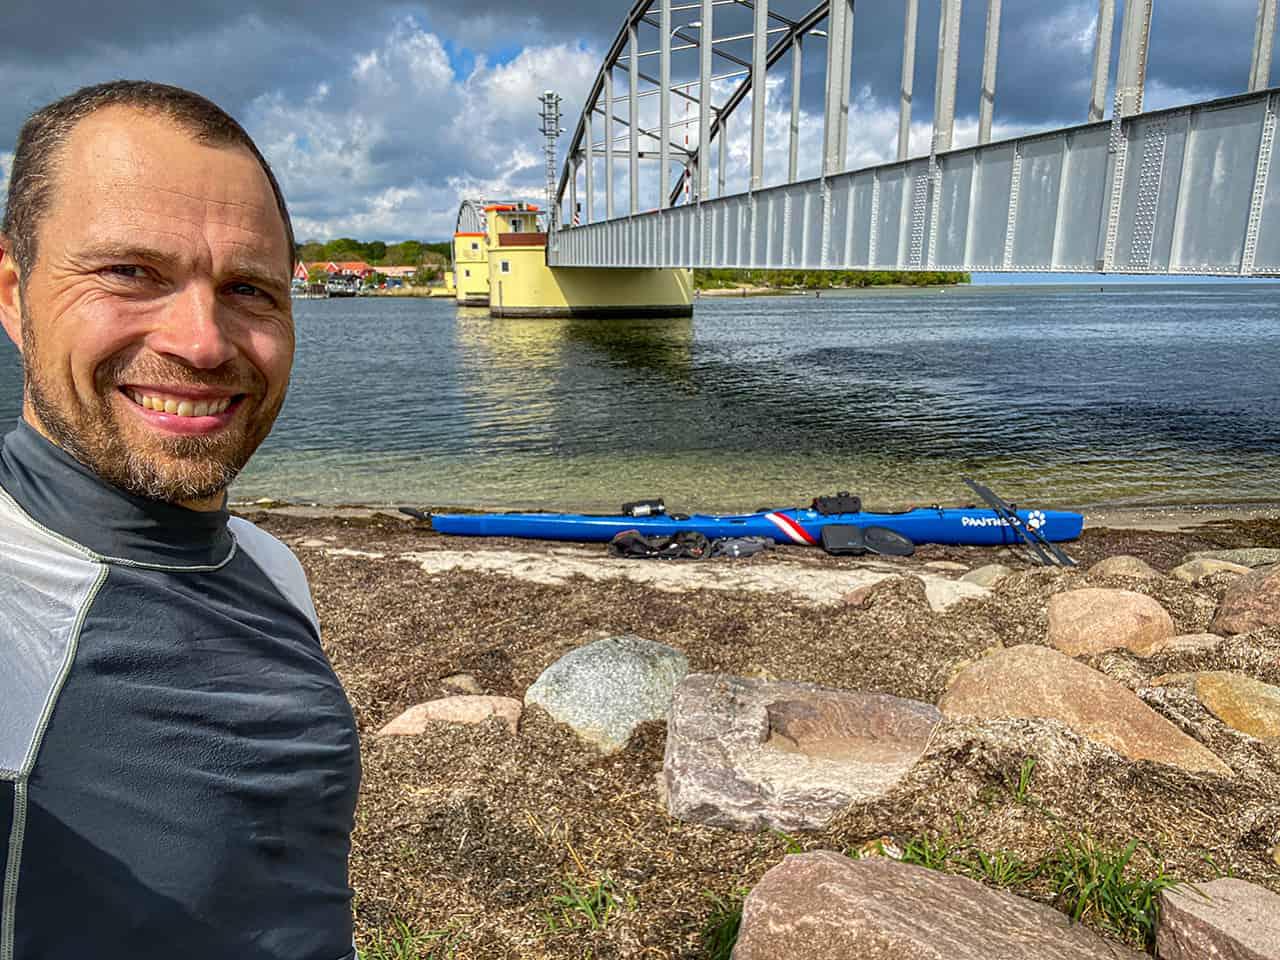 Erik B. Jørgensen på Kajaktur i Smålandsfarvandet (Fejø og Femø) [Mikroeventyr]